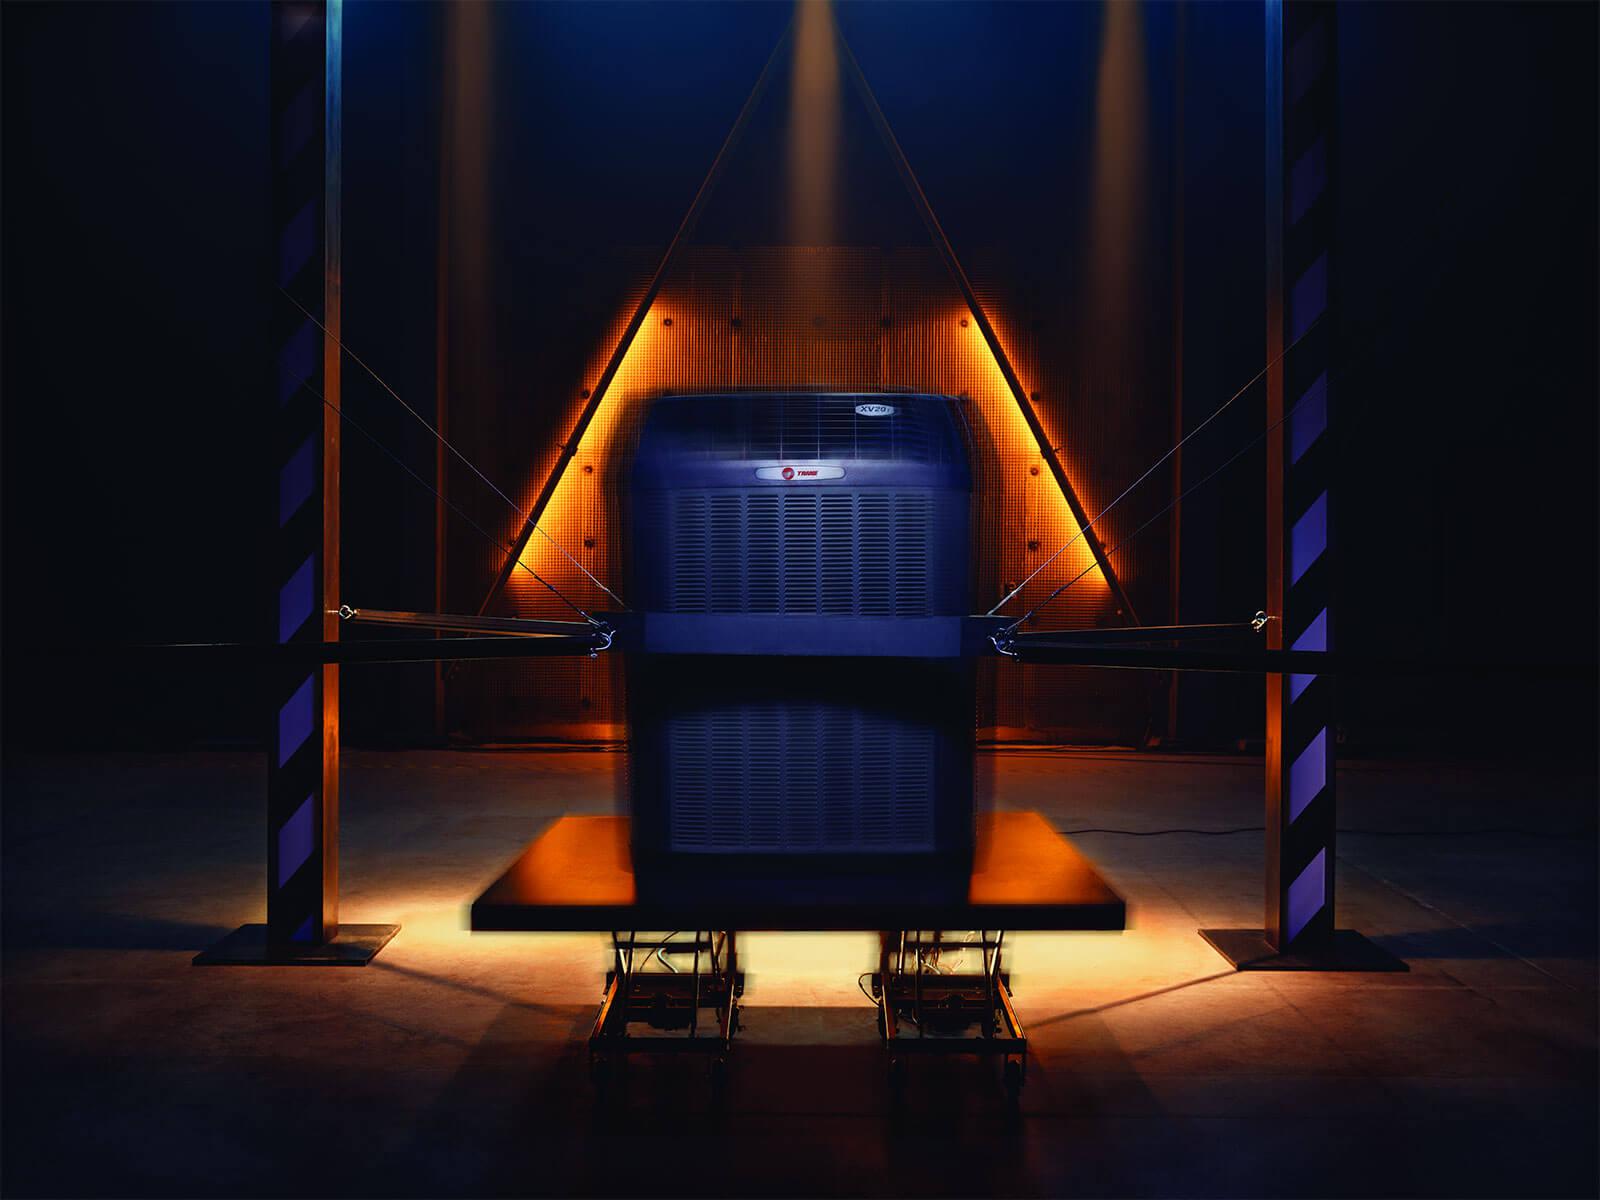 Trane HVAC and Generac Whole Home Generator